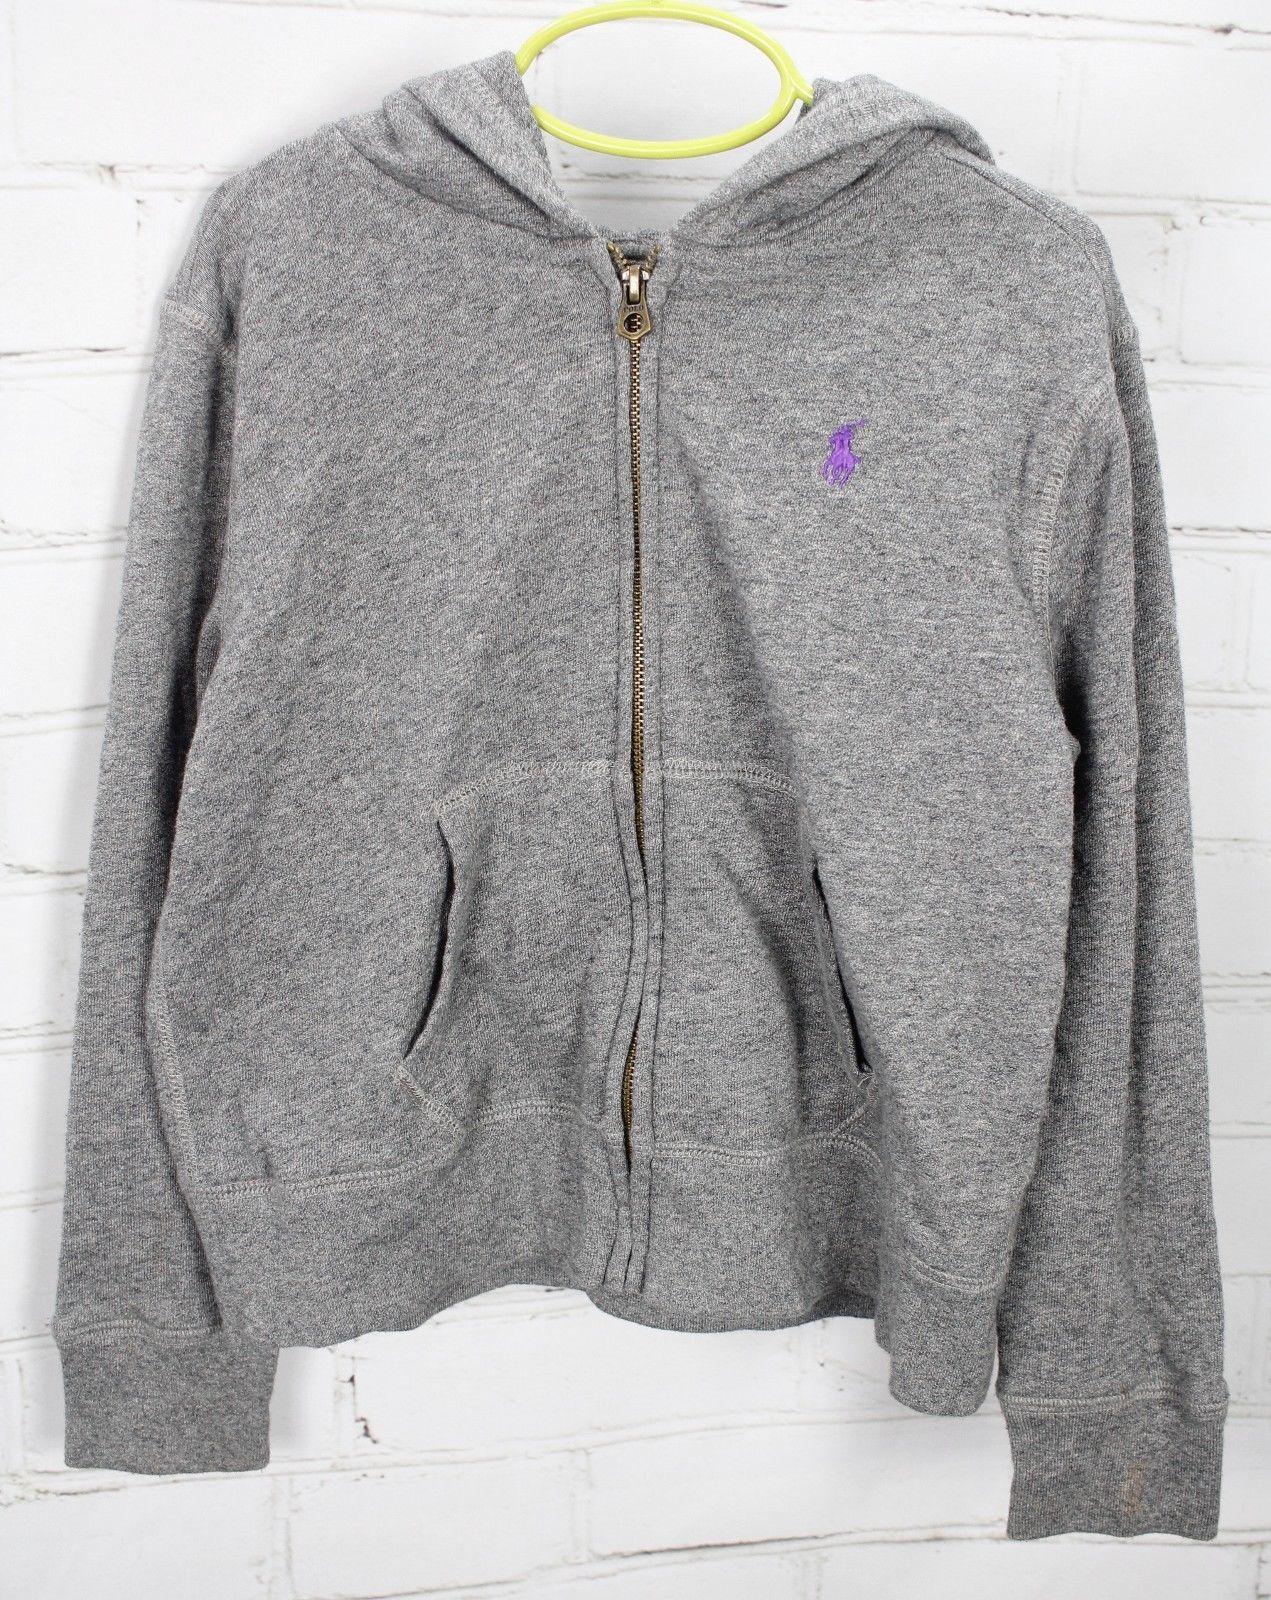 9d08974db Ralph Lauren Polo Hoodie Sweatshirt Youth and similar items. 57